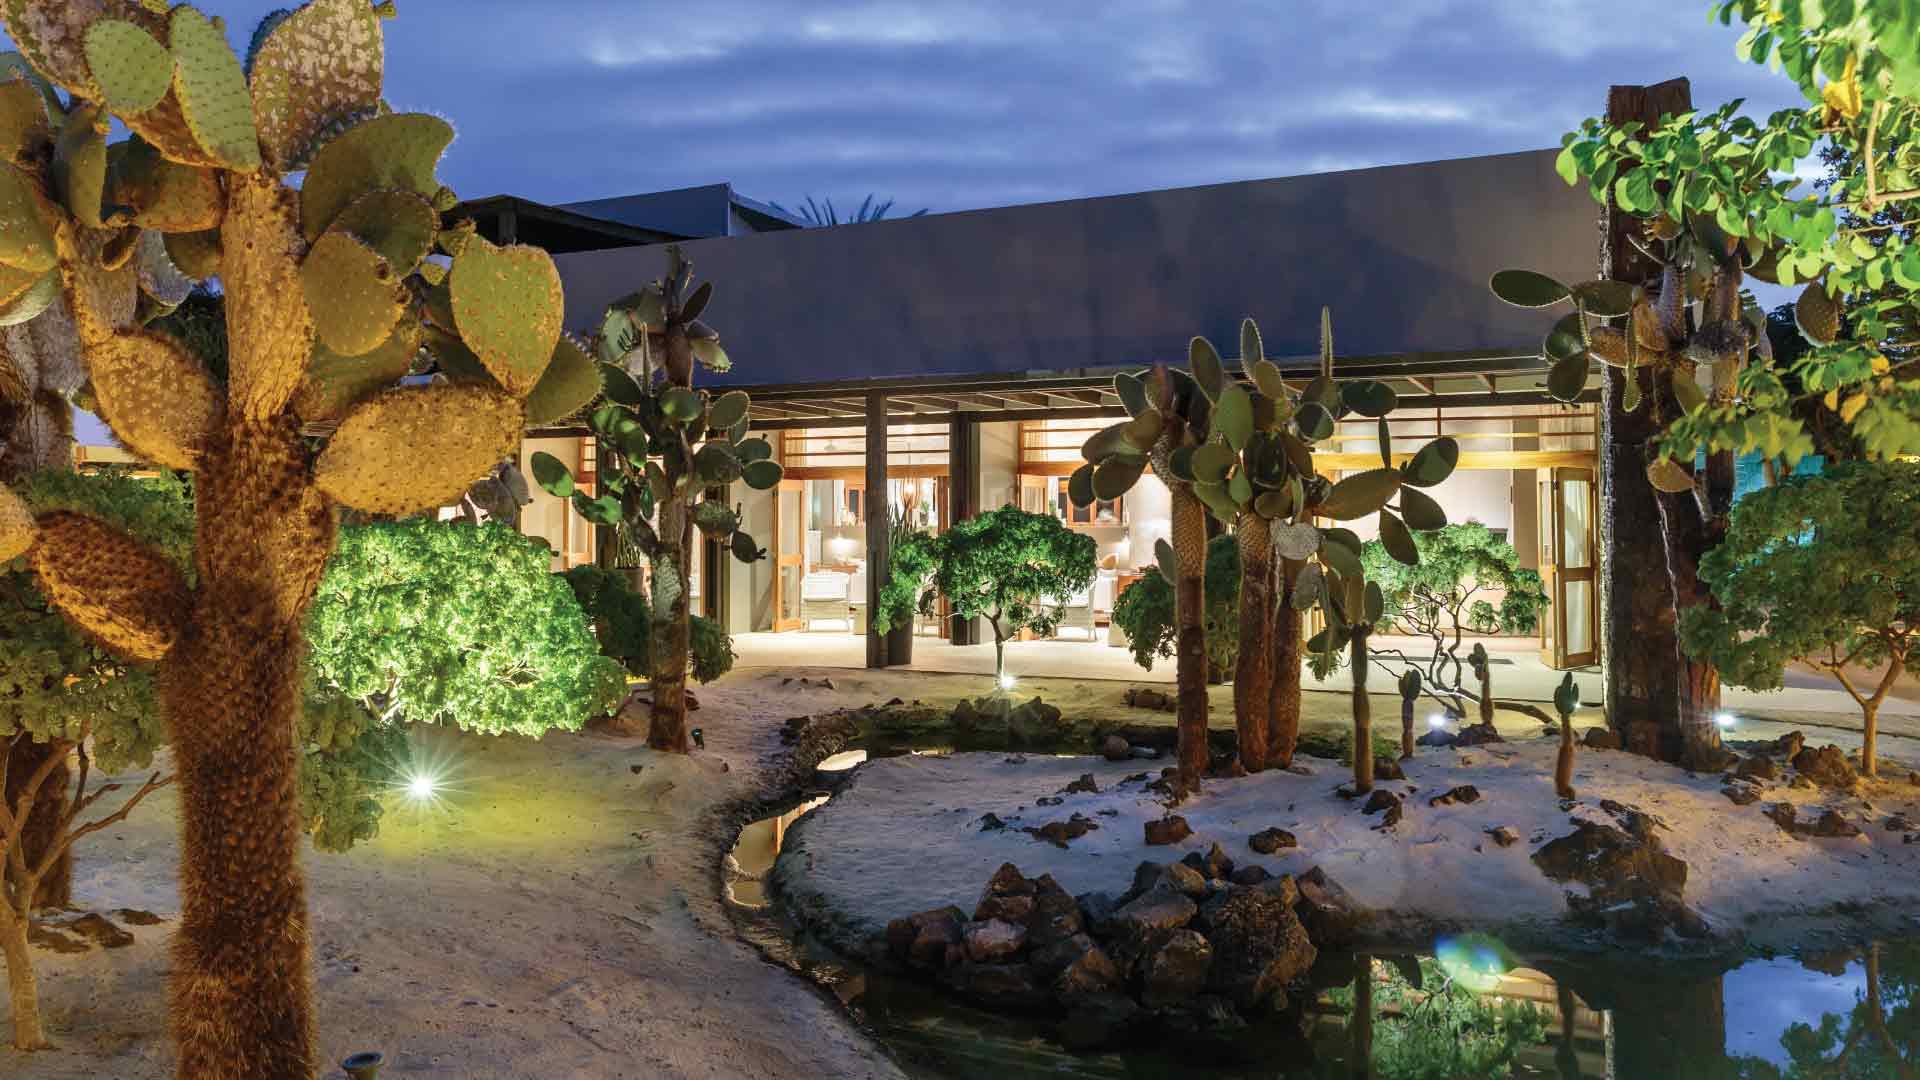 outside cactus garden at finch bay hotel